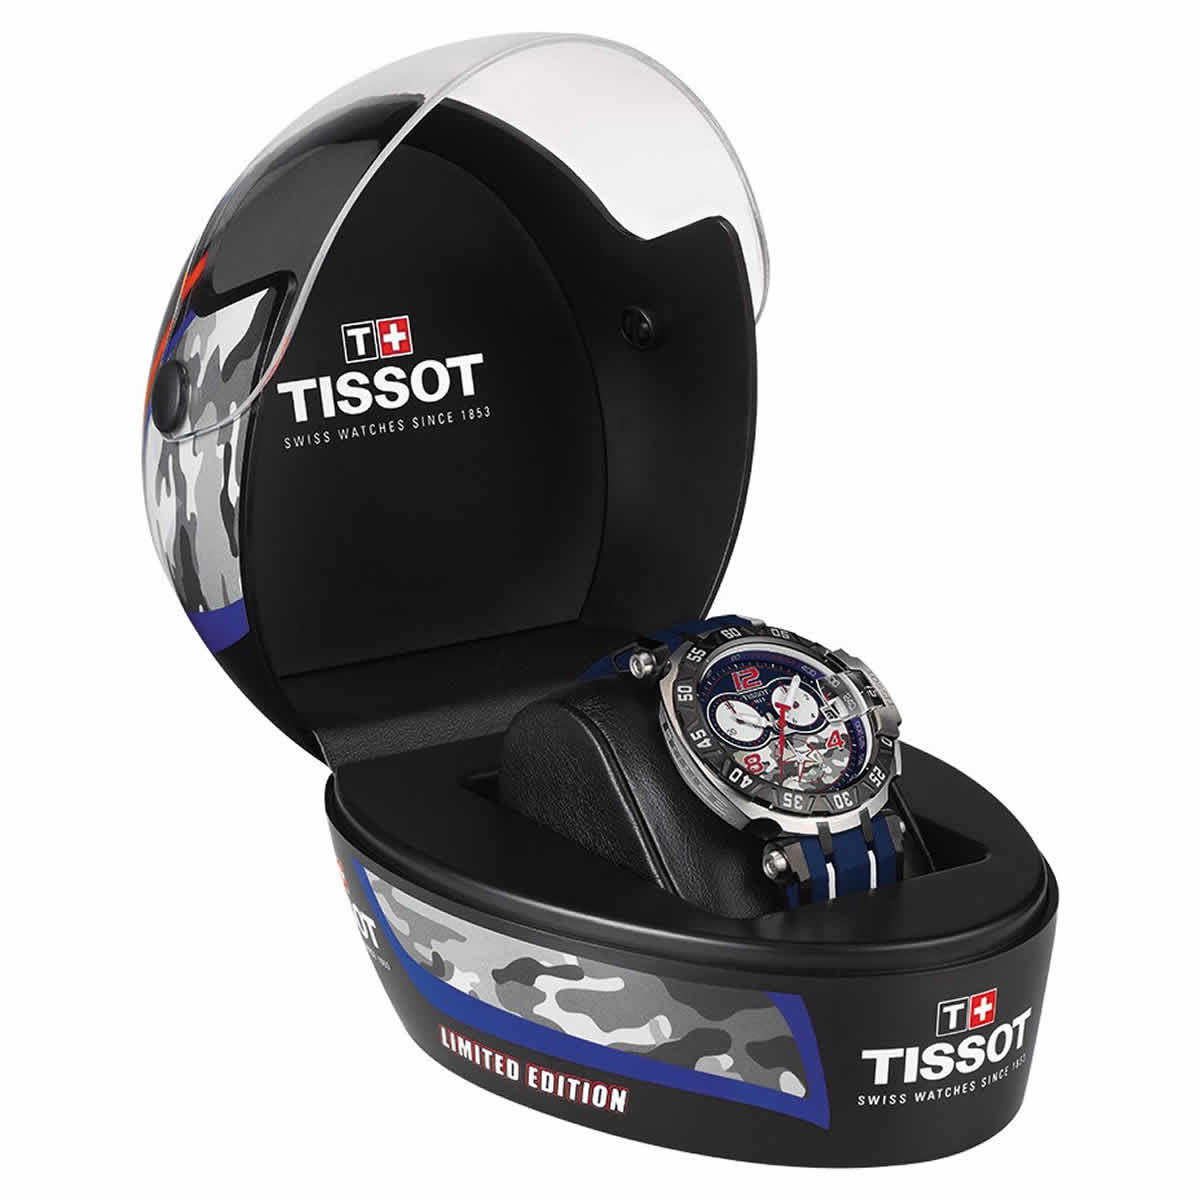 TISSOT T-RACE NICKY HAYDEN 2016